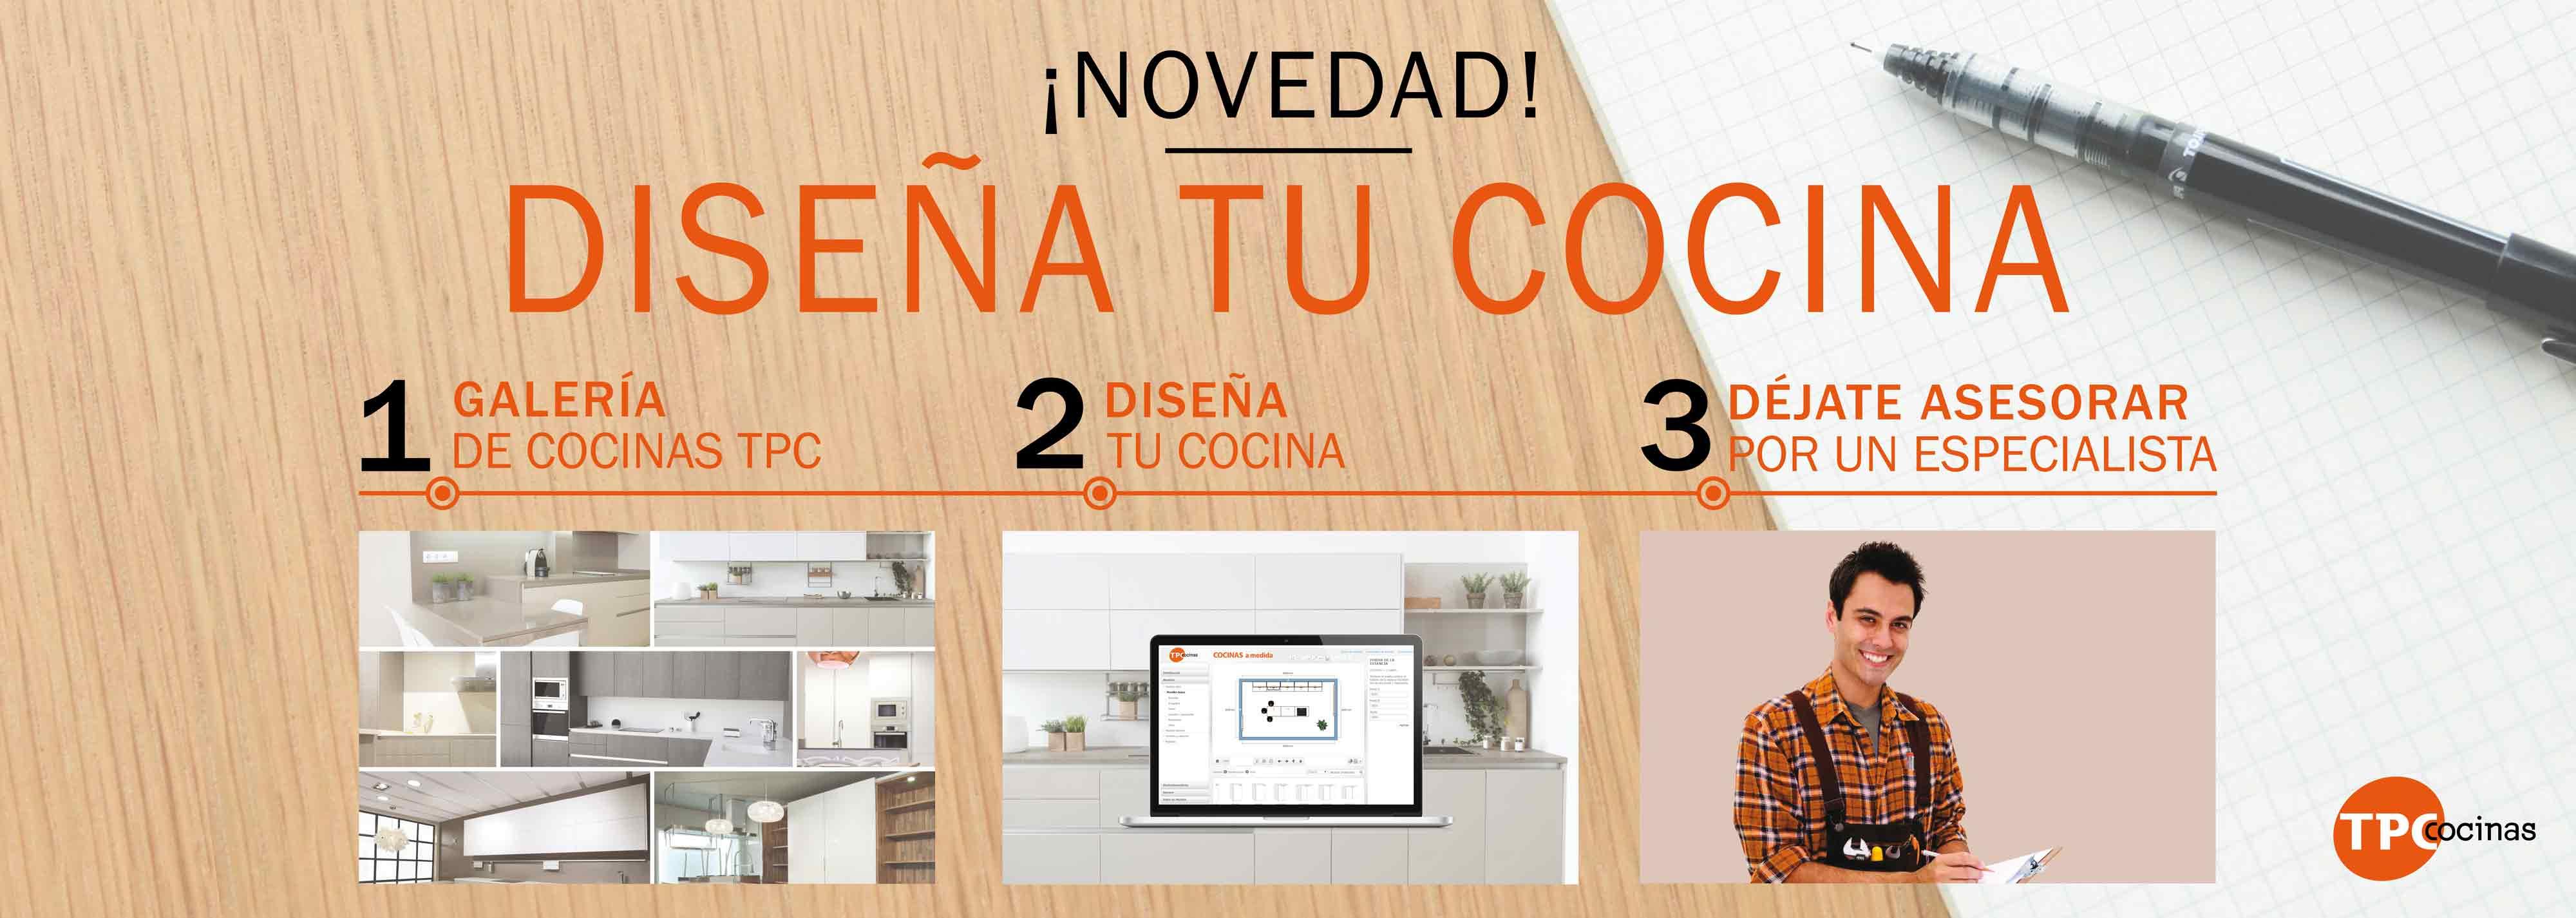 Dise a tu cocina en 3d online casa dise o casa dise o for Disena tu mueble online